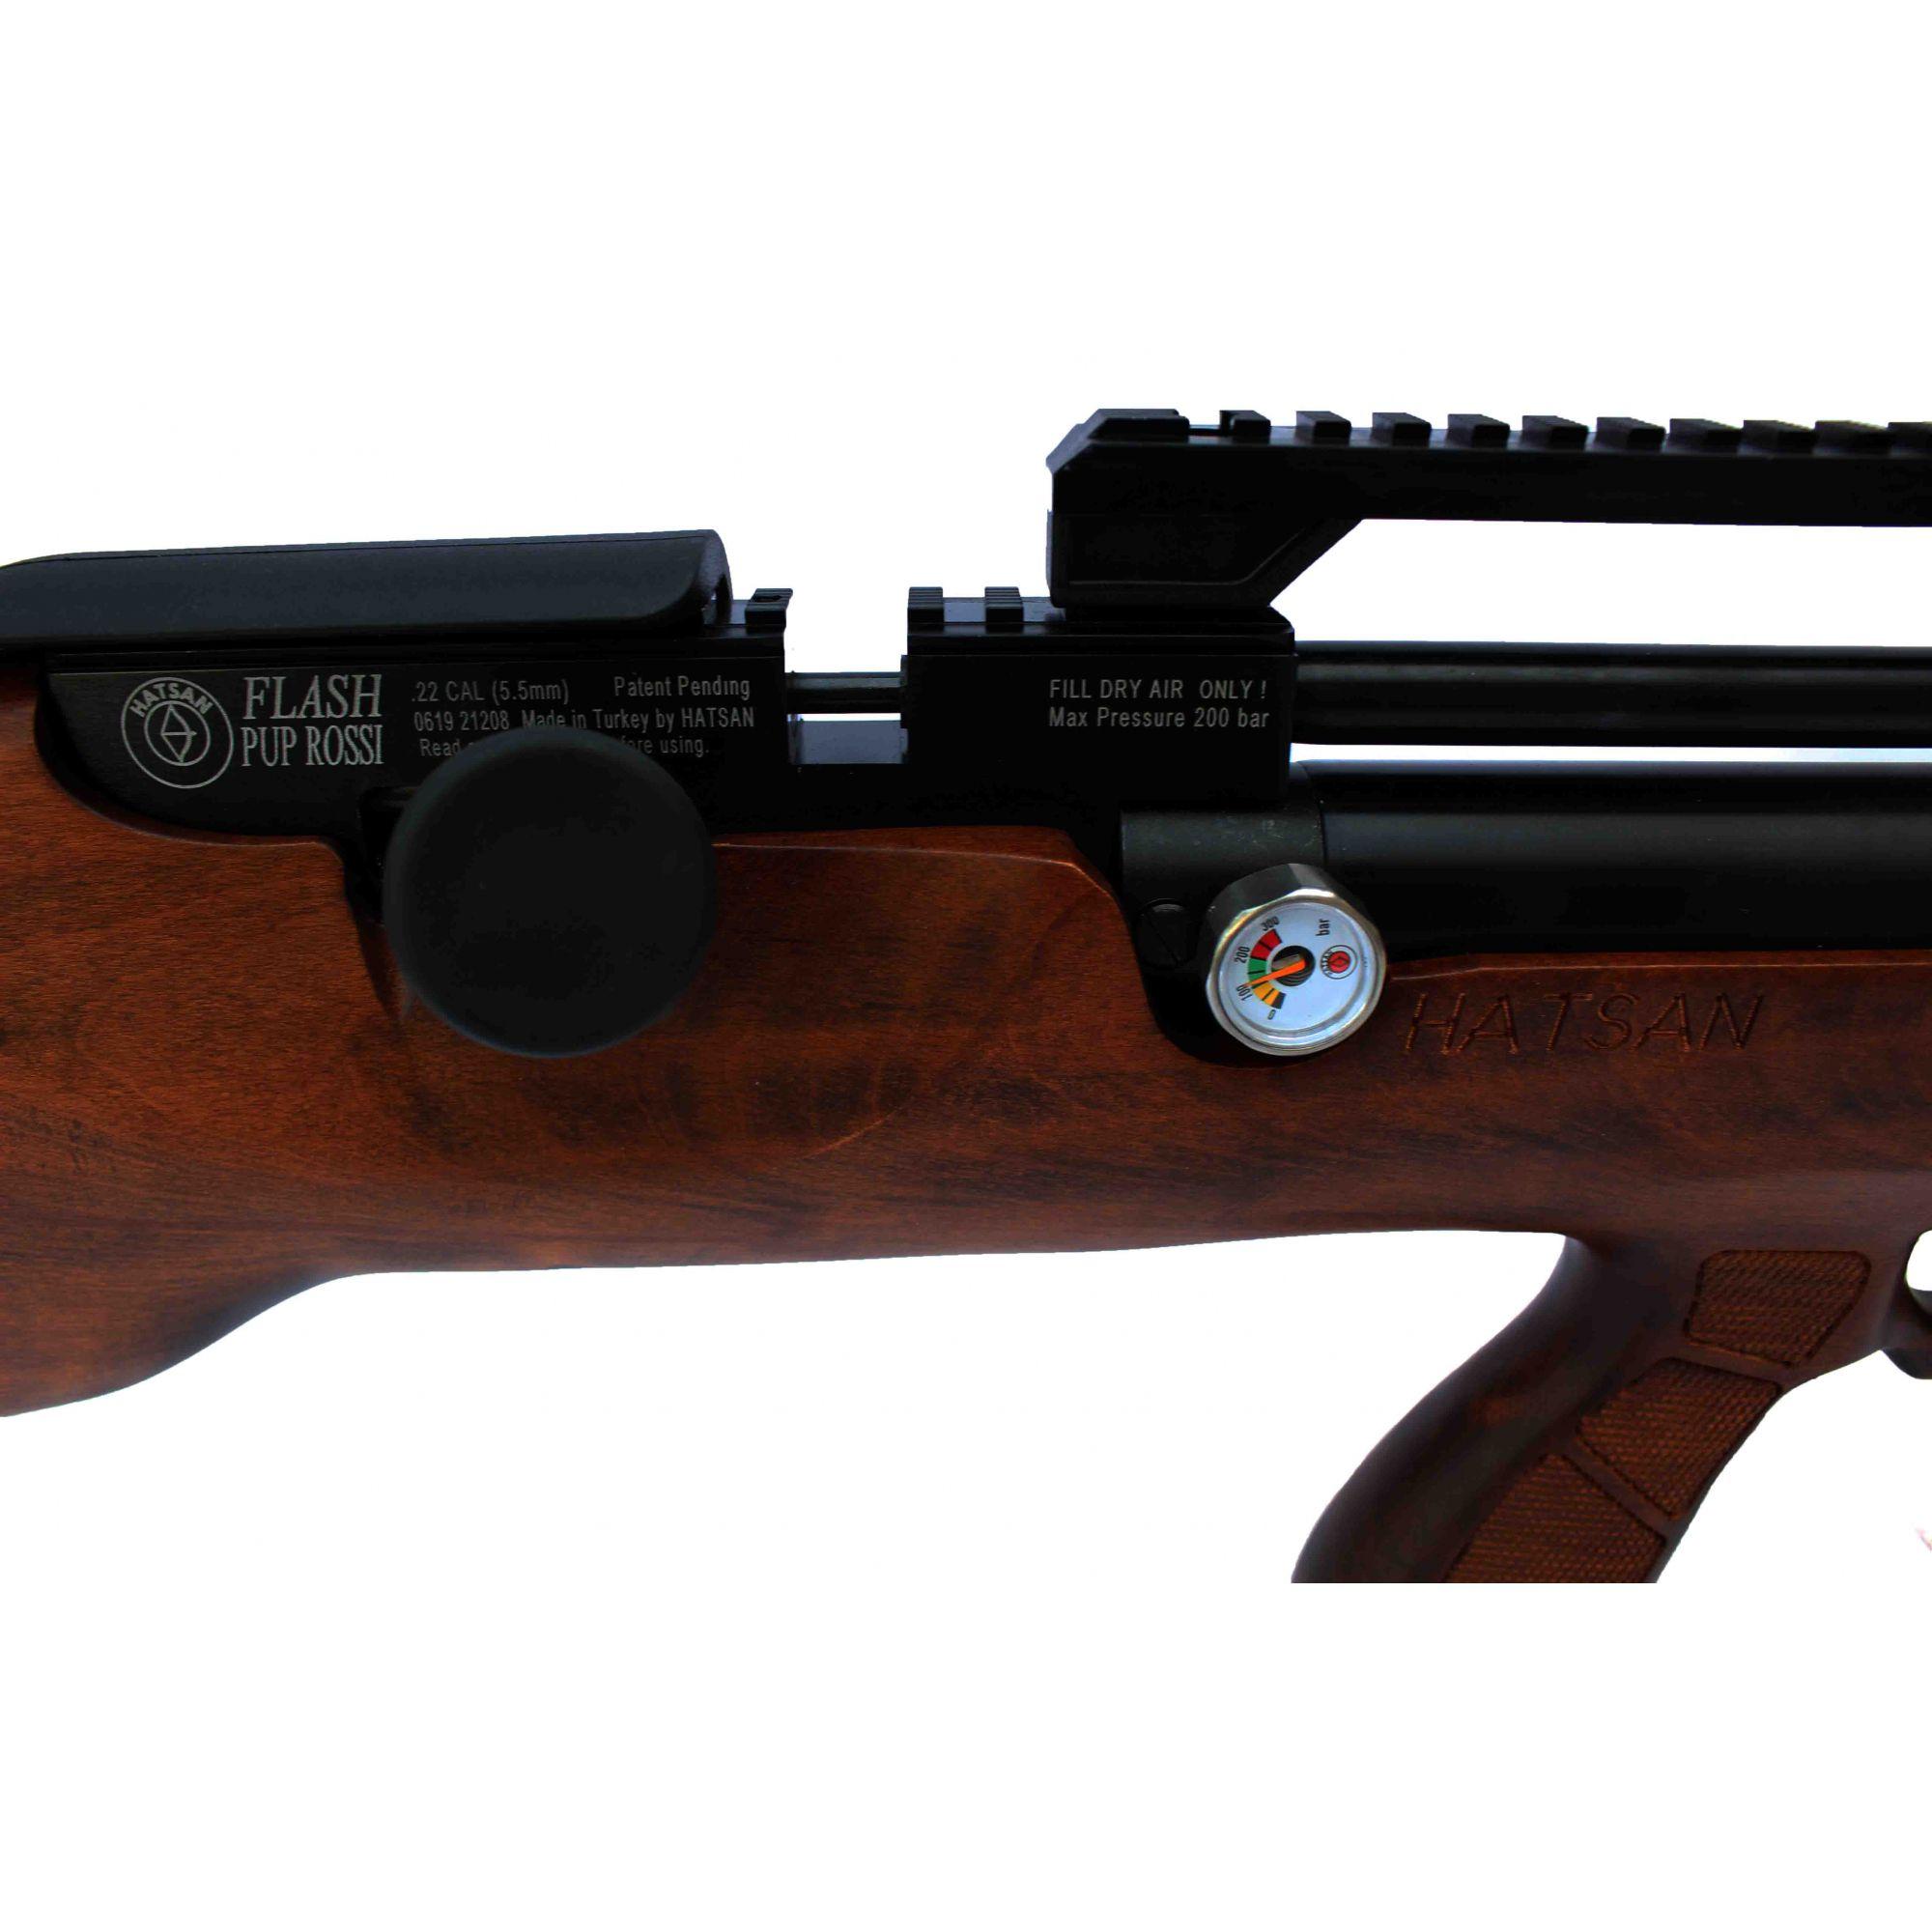 Carabina de Pressão PCP Hatsan Flashpup Wood 5,5mm